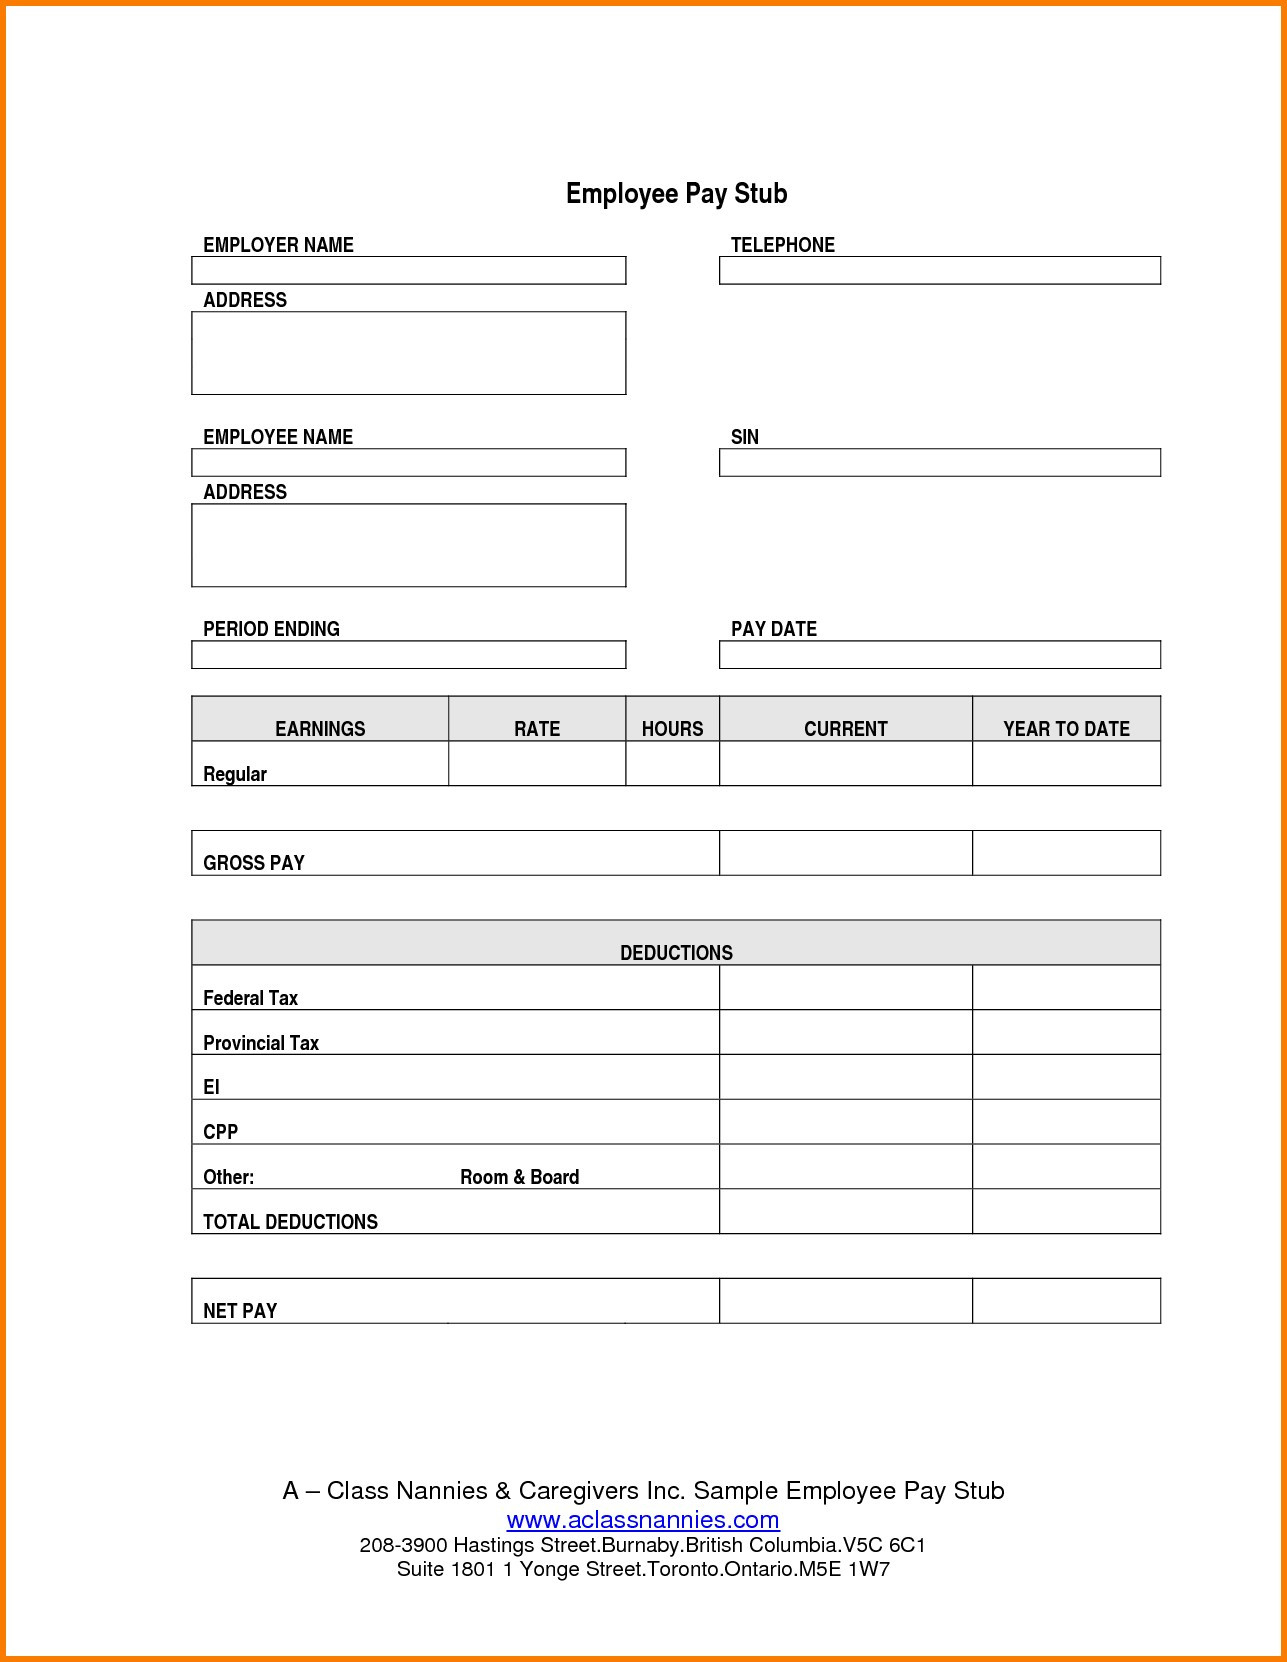 Adp Paystub Template Payroll Sheet Editable Free Printable Check - Free Printable Check Stubs